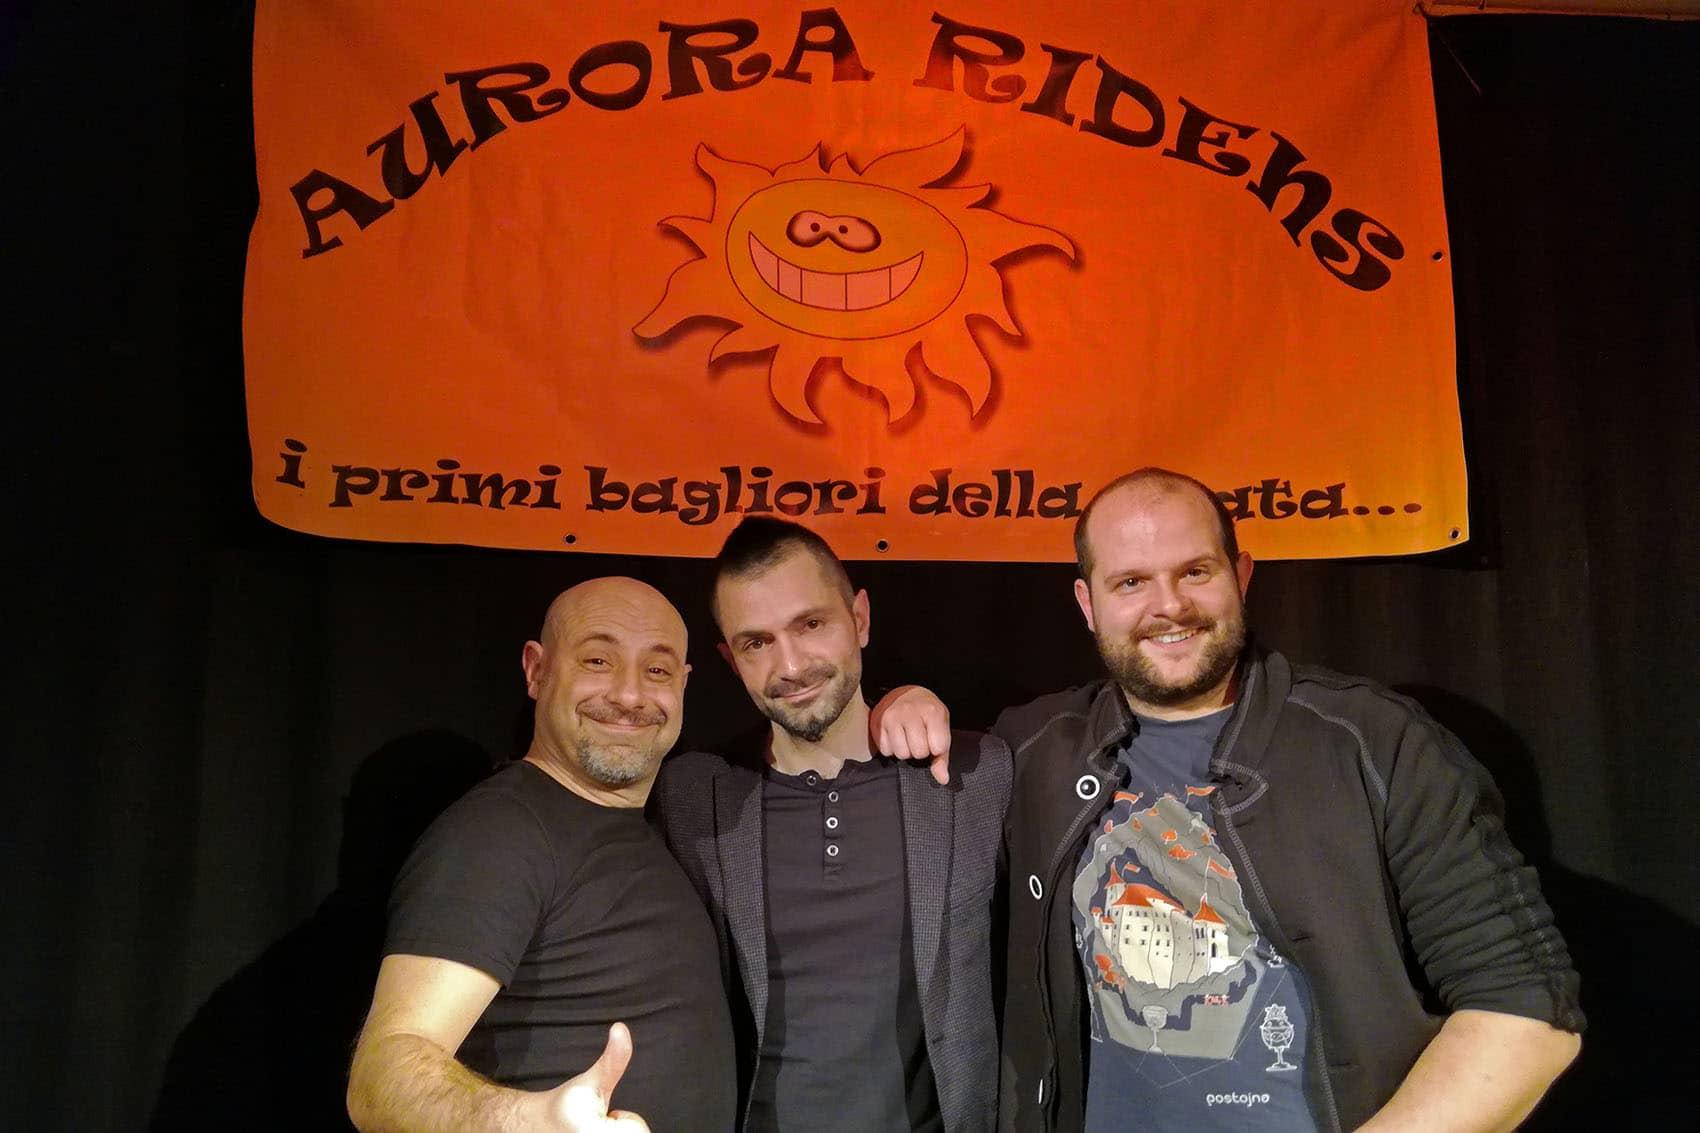 Photo of Aurora Ridens termina con un comico asse siculo-toscano